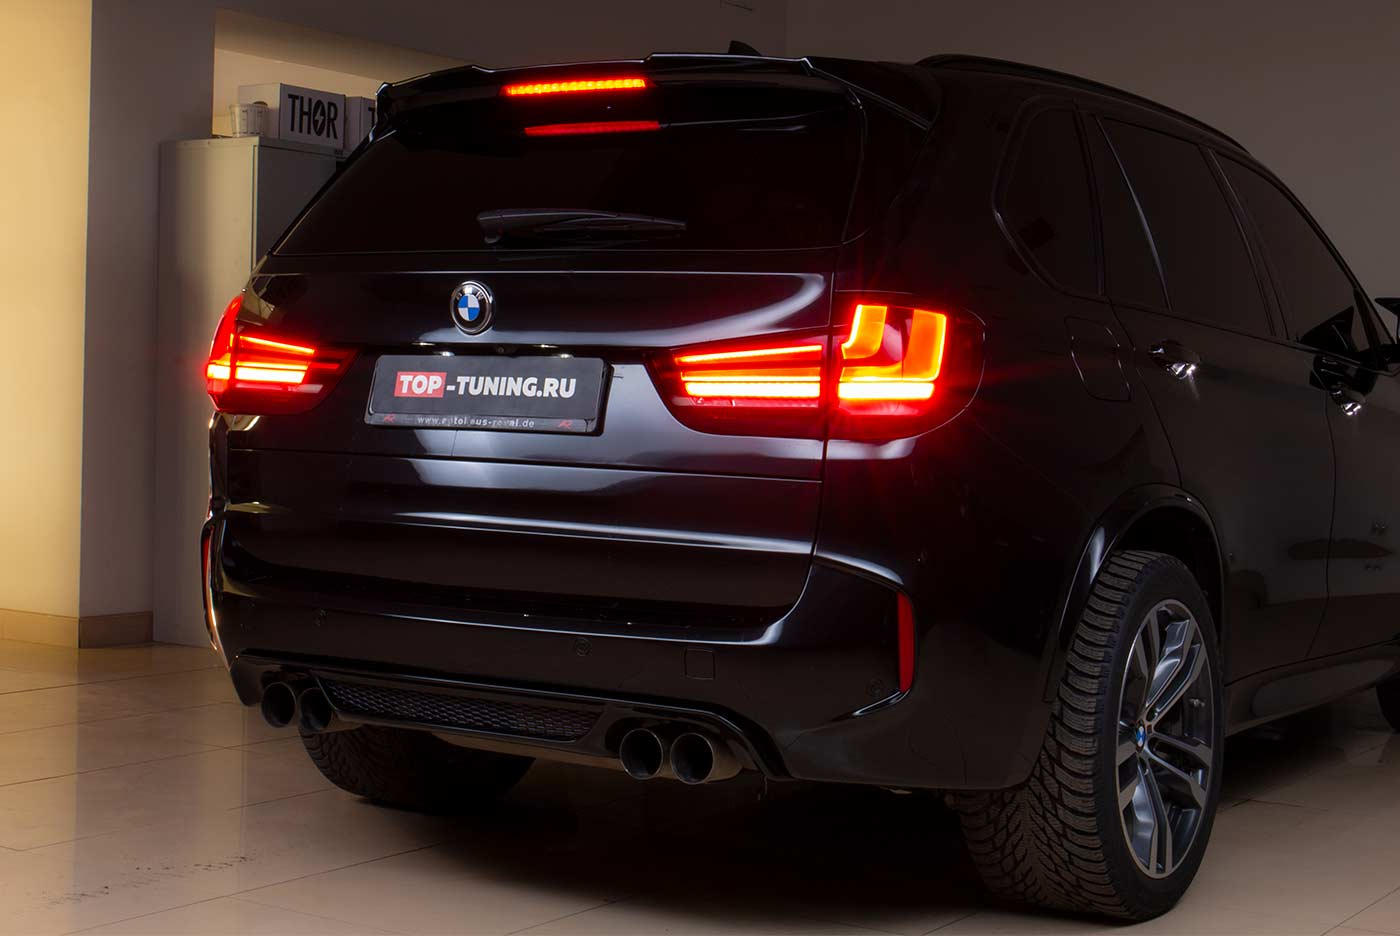 103060 Новый М-бампер F85 для BMW X5 F15 + многое другое